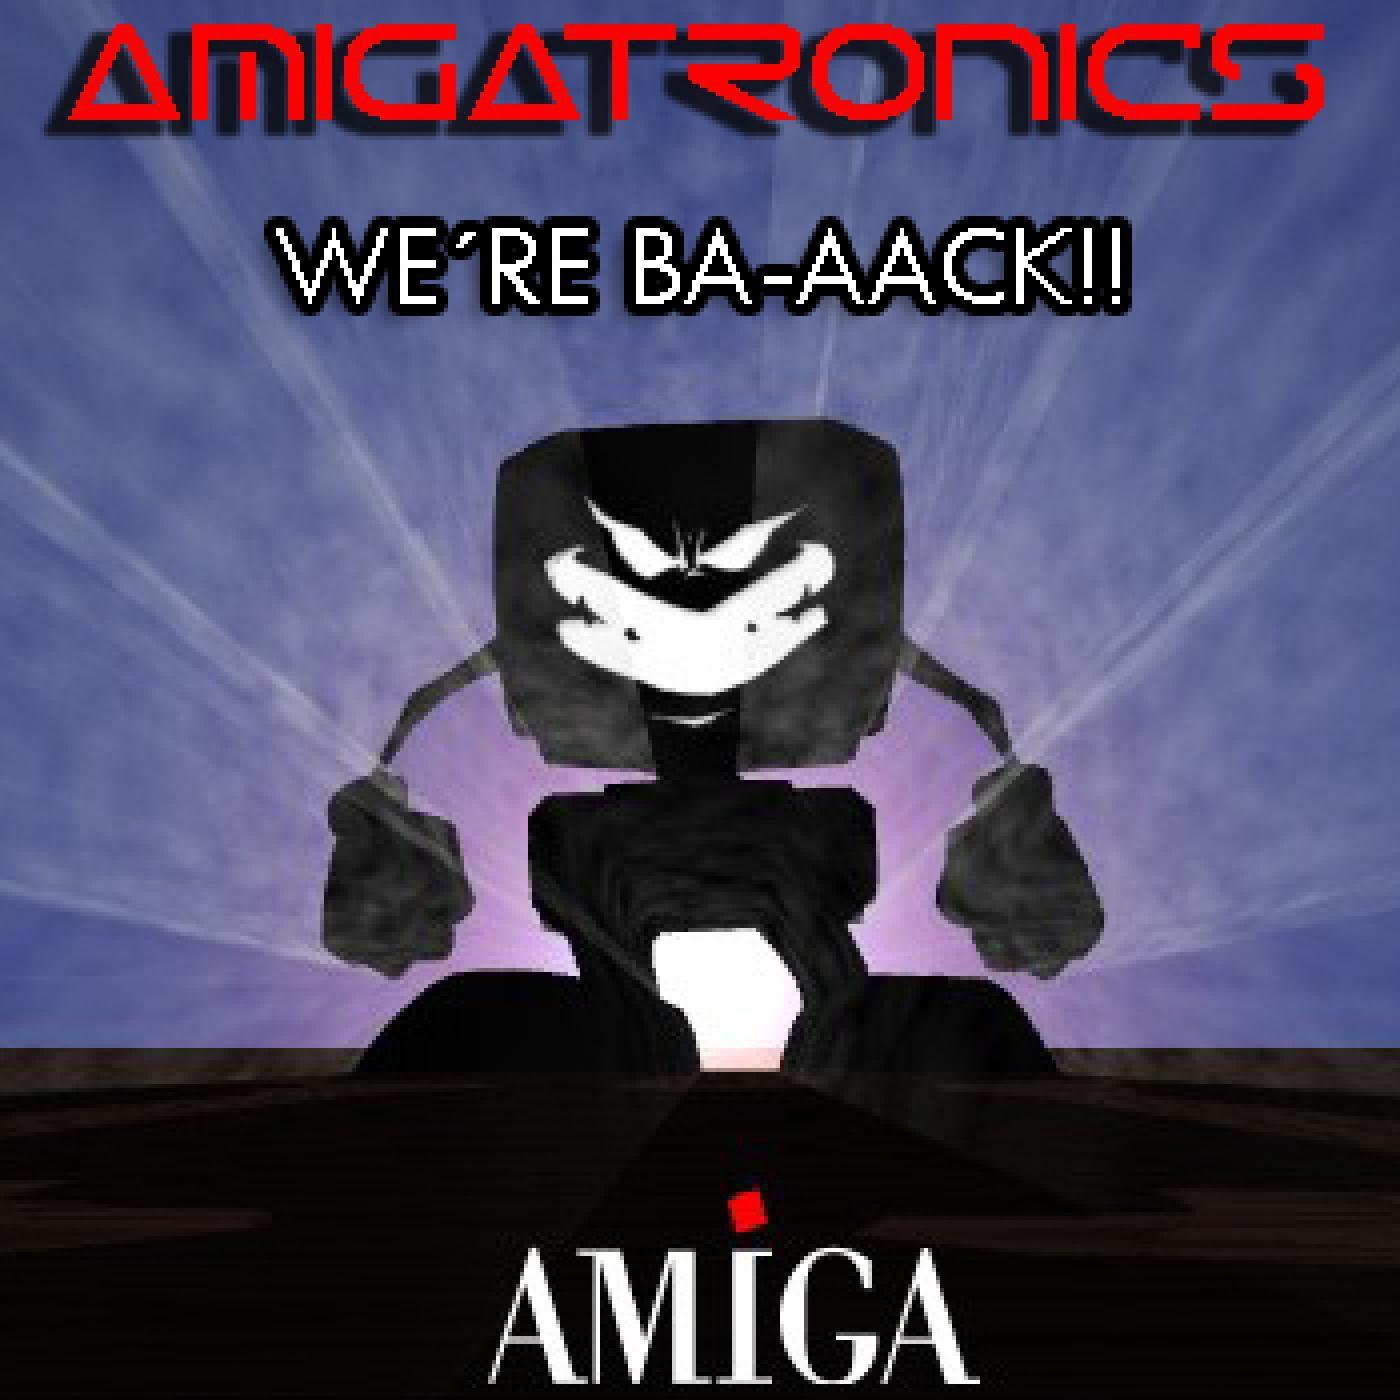 Amigatronics, the podcast 3x04